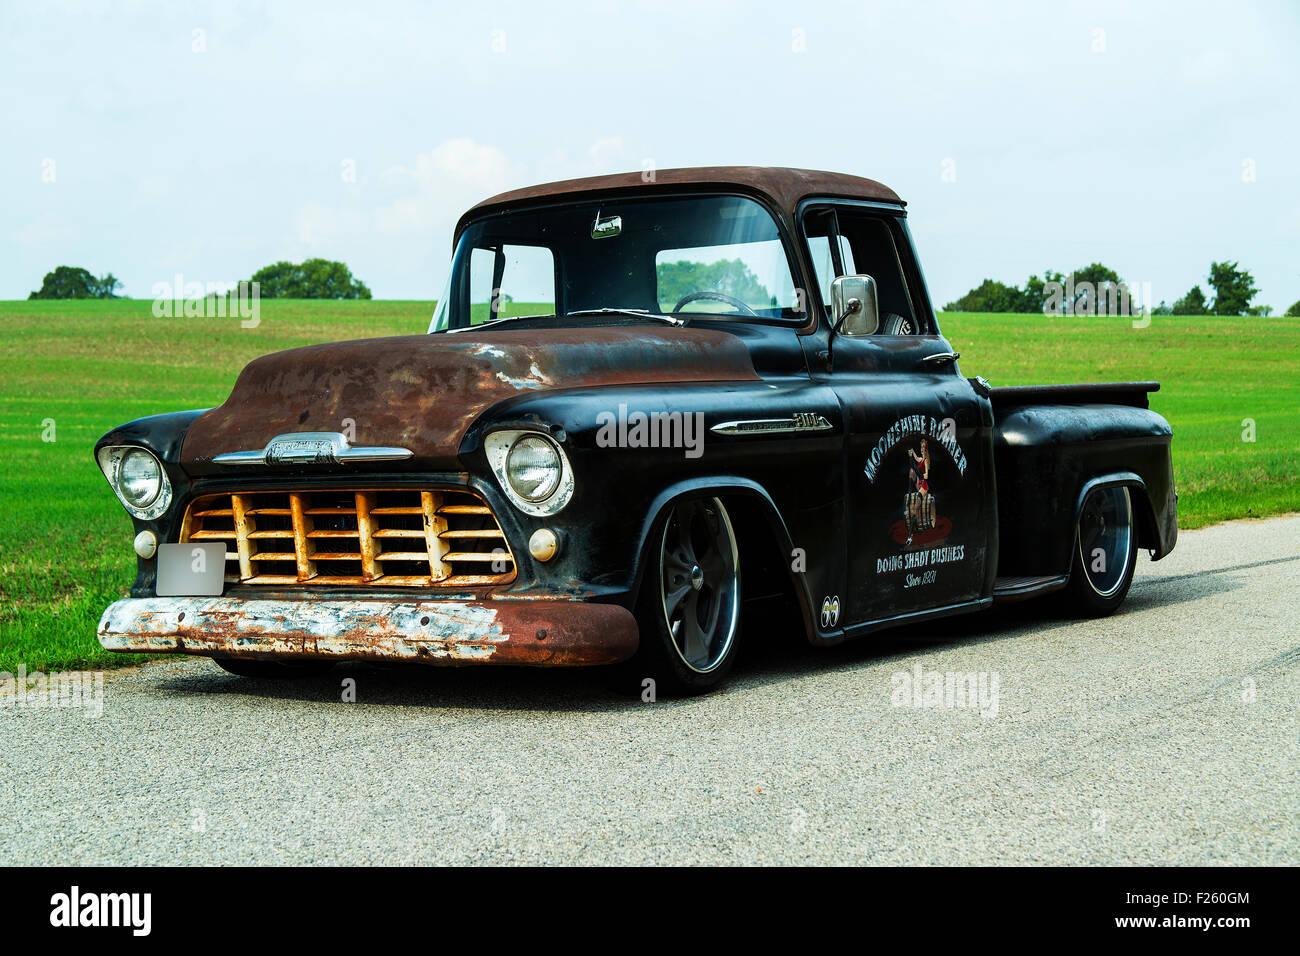 Custom Pickup Trucks >> 1956 Chevrolet Custom Rat Rod Pickup Truck Stock Photo 87413332 Alamy